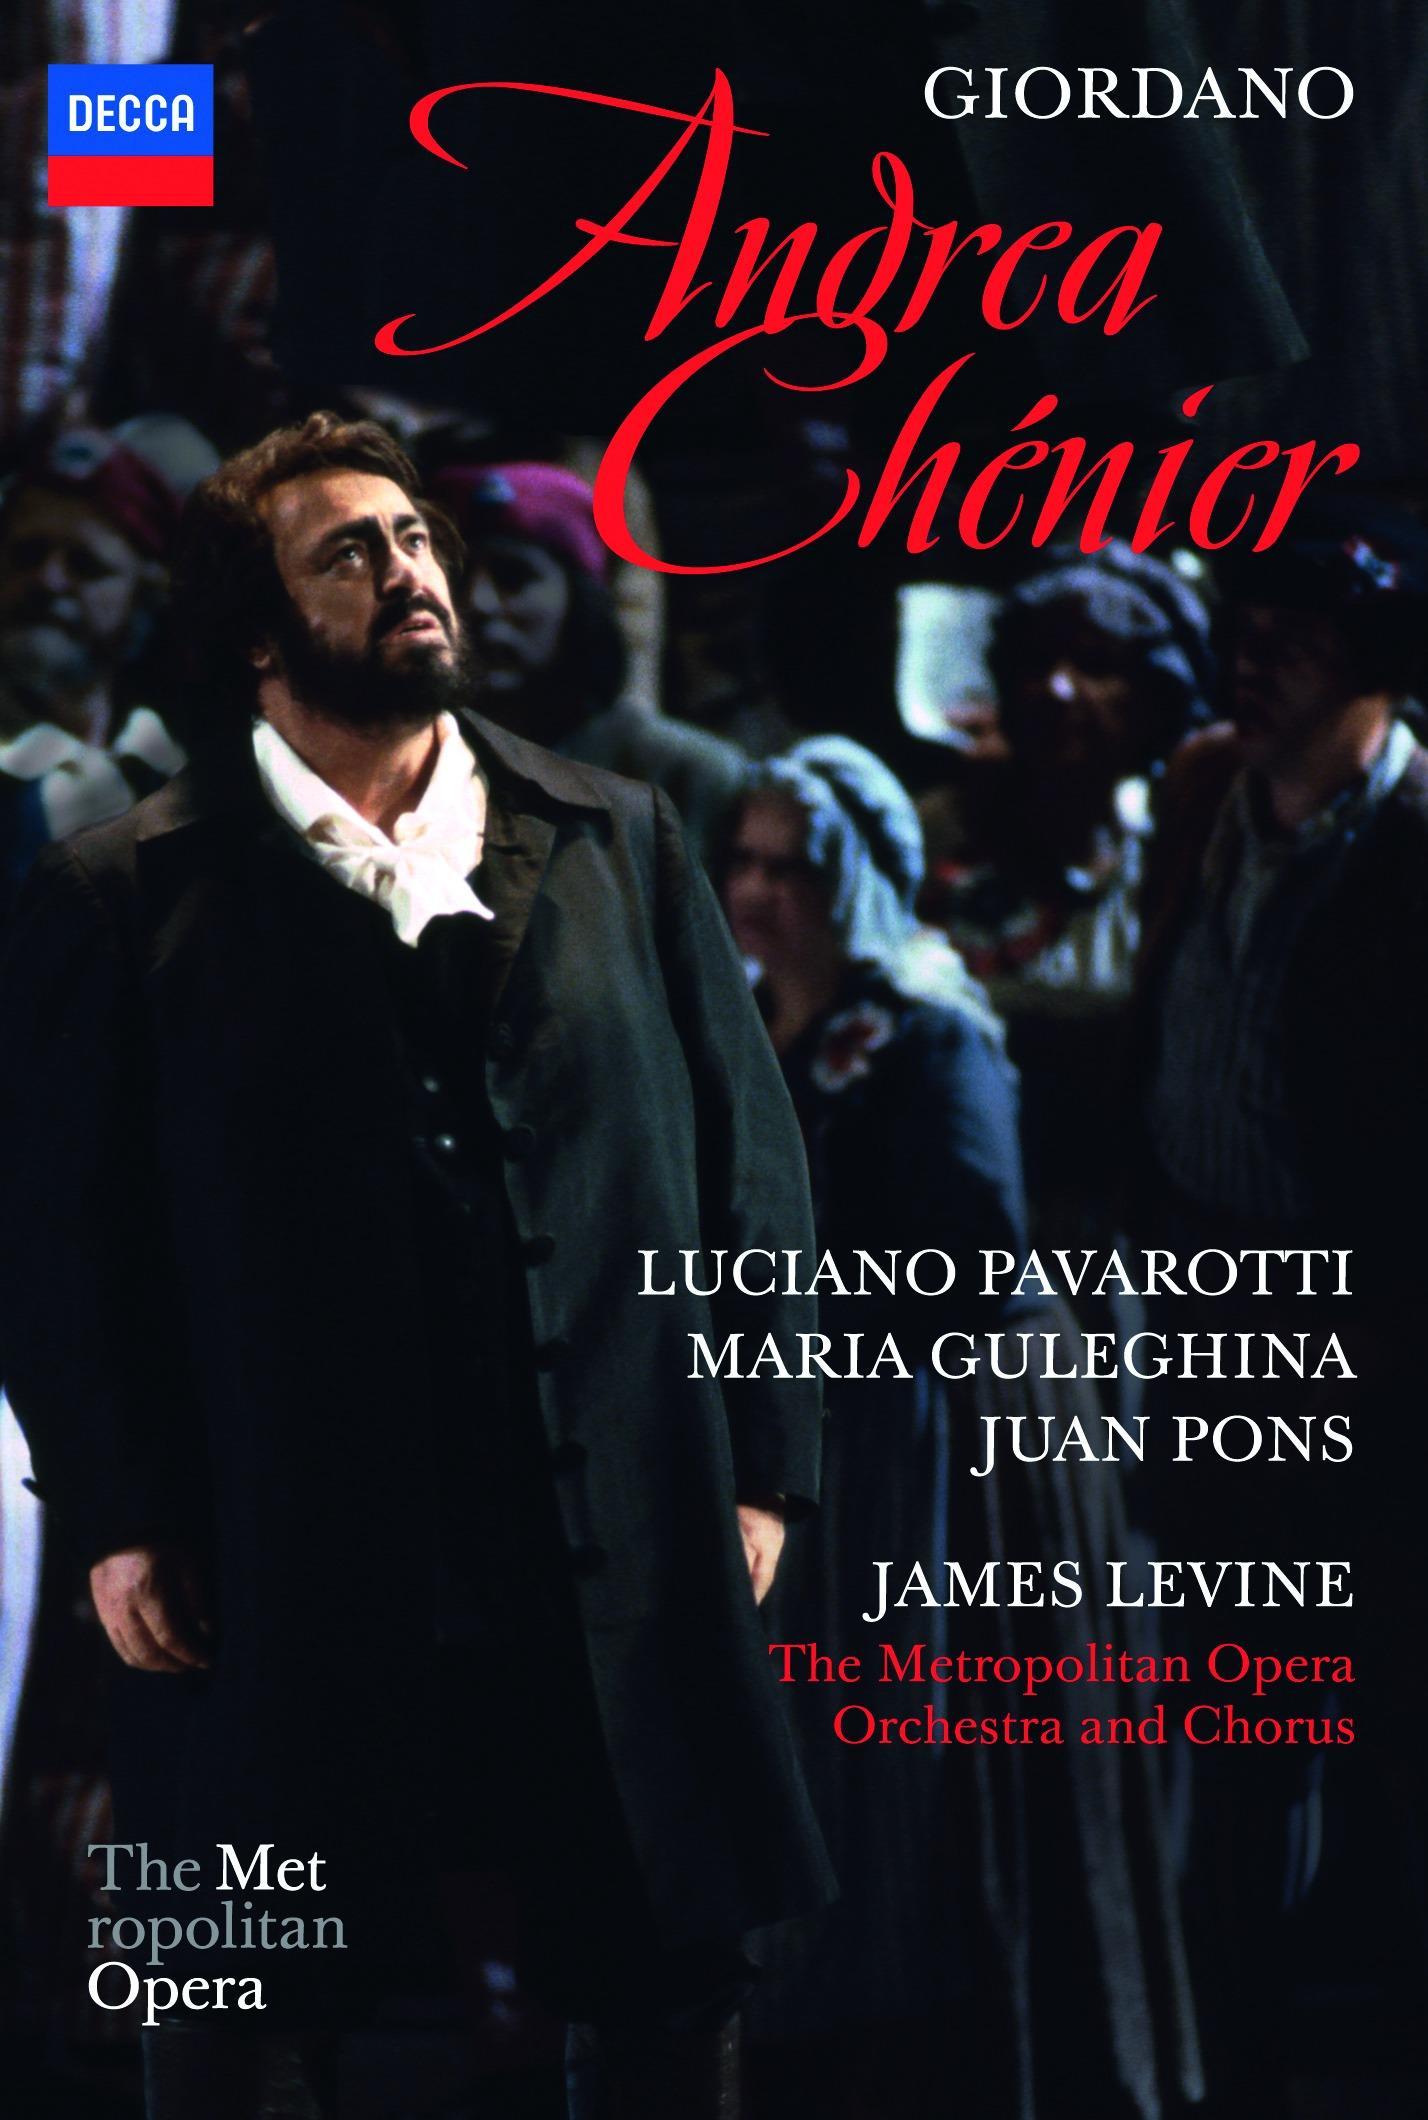 ANDREA CHENIER/ JAMES LEVINE, LUCIANO PAVAROTTI [조르다노: 안드레아 셰니에/ 루치아노 파바로티]